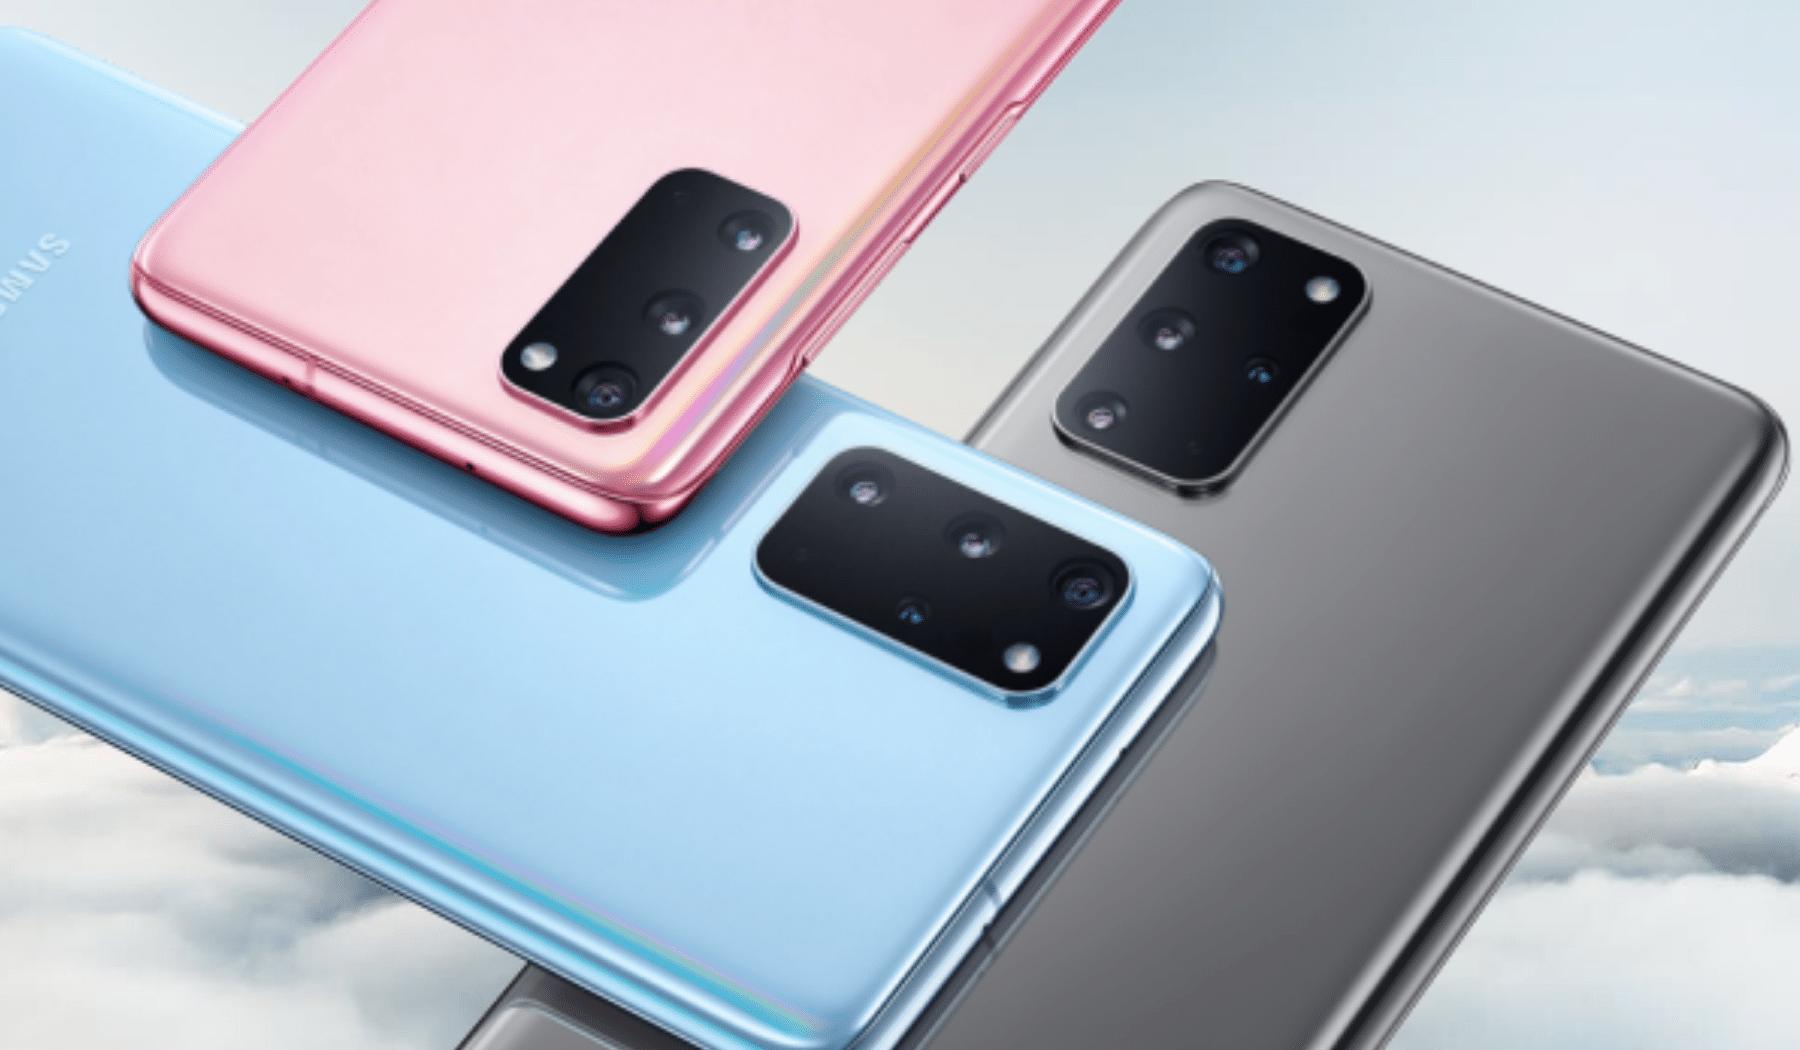 Samsung Galaxy S21 FE : quelques mois de retard bien probable !